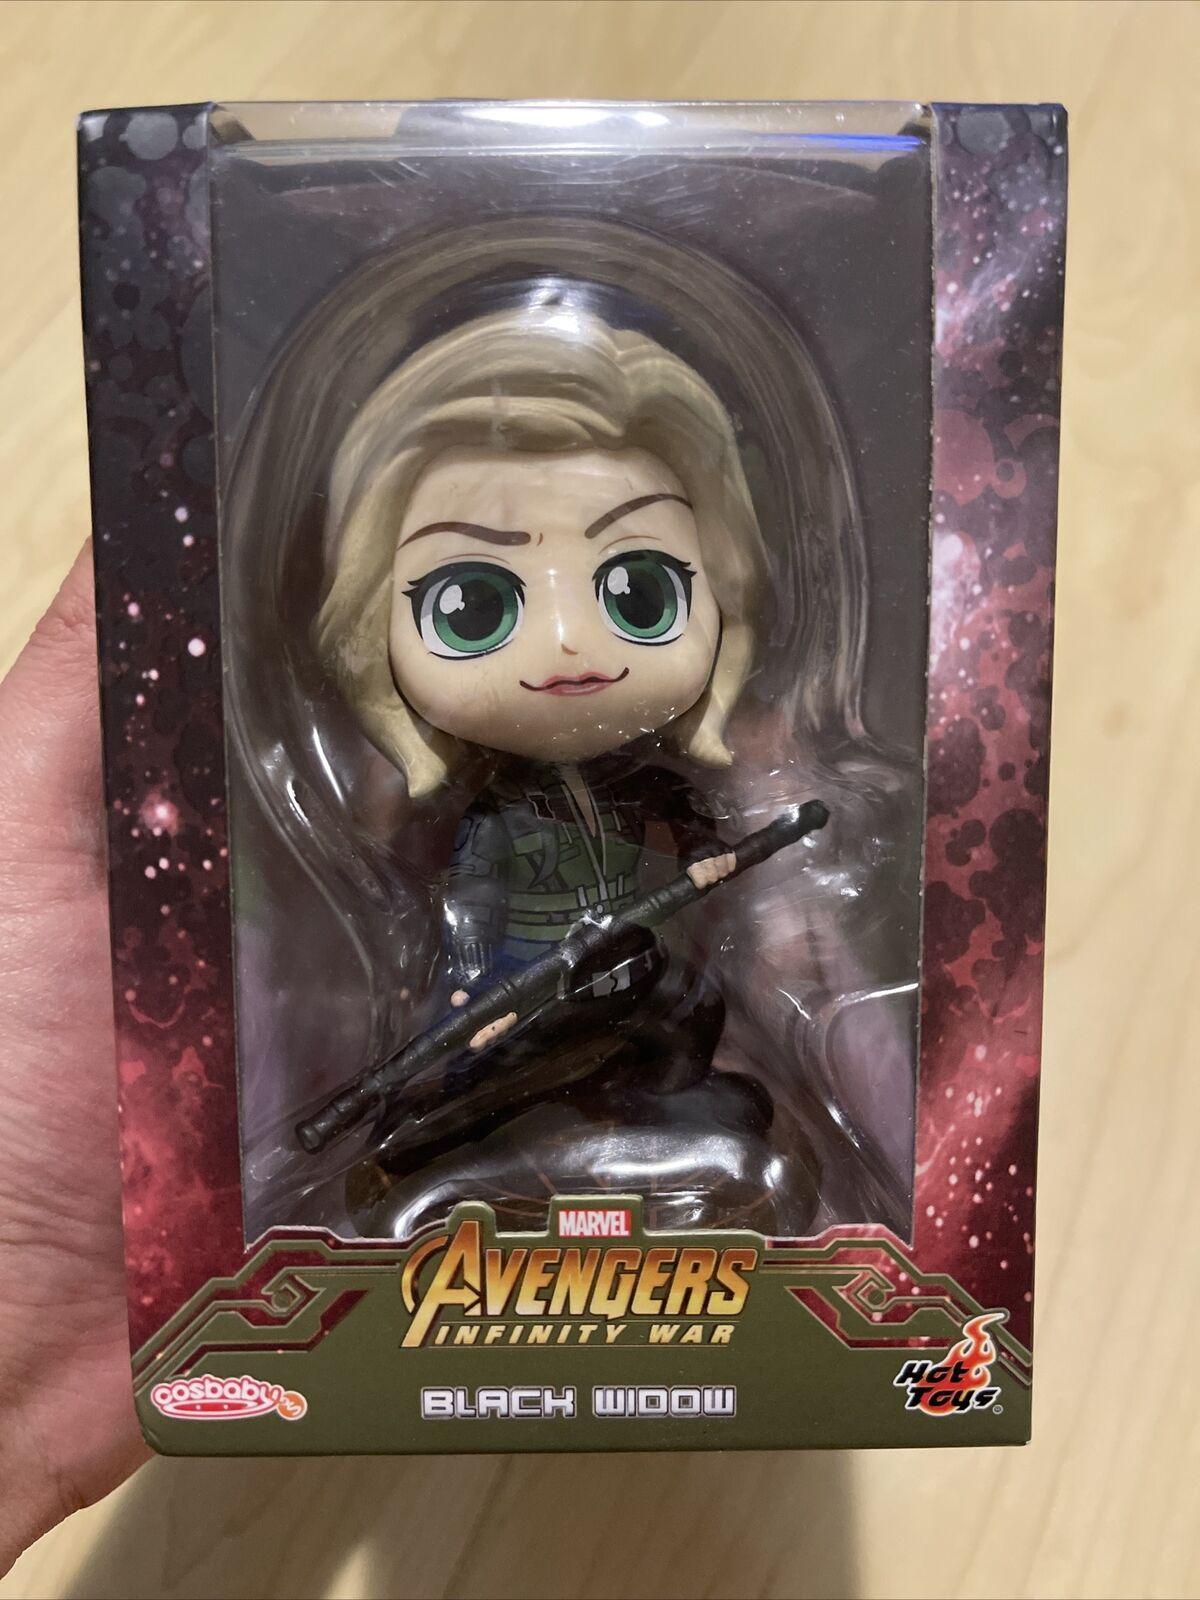 Marvel Avengers Infinity War Cosbaby Black Widow 4 Inch Hot Toys Bobblehead NEW on eBay thumbnail